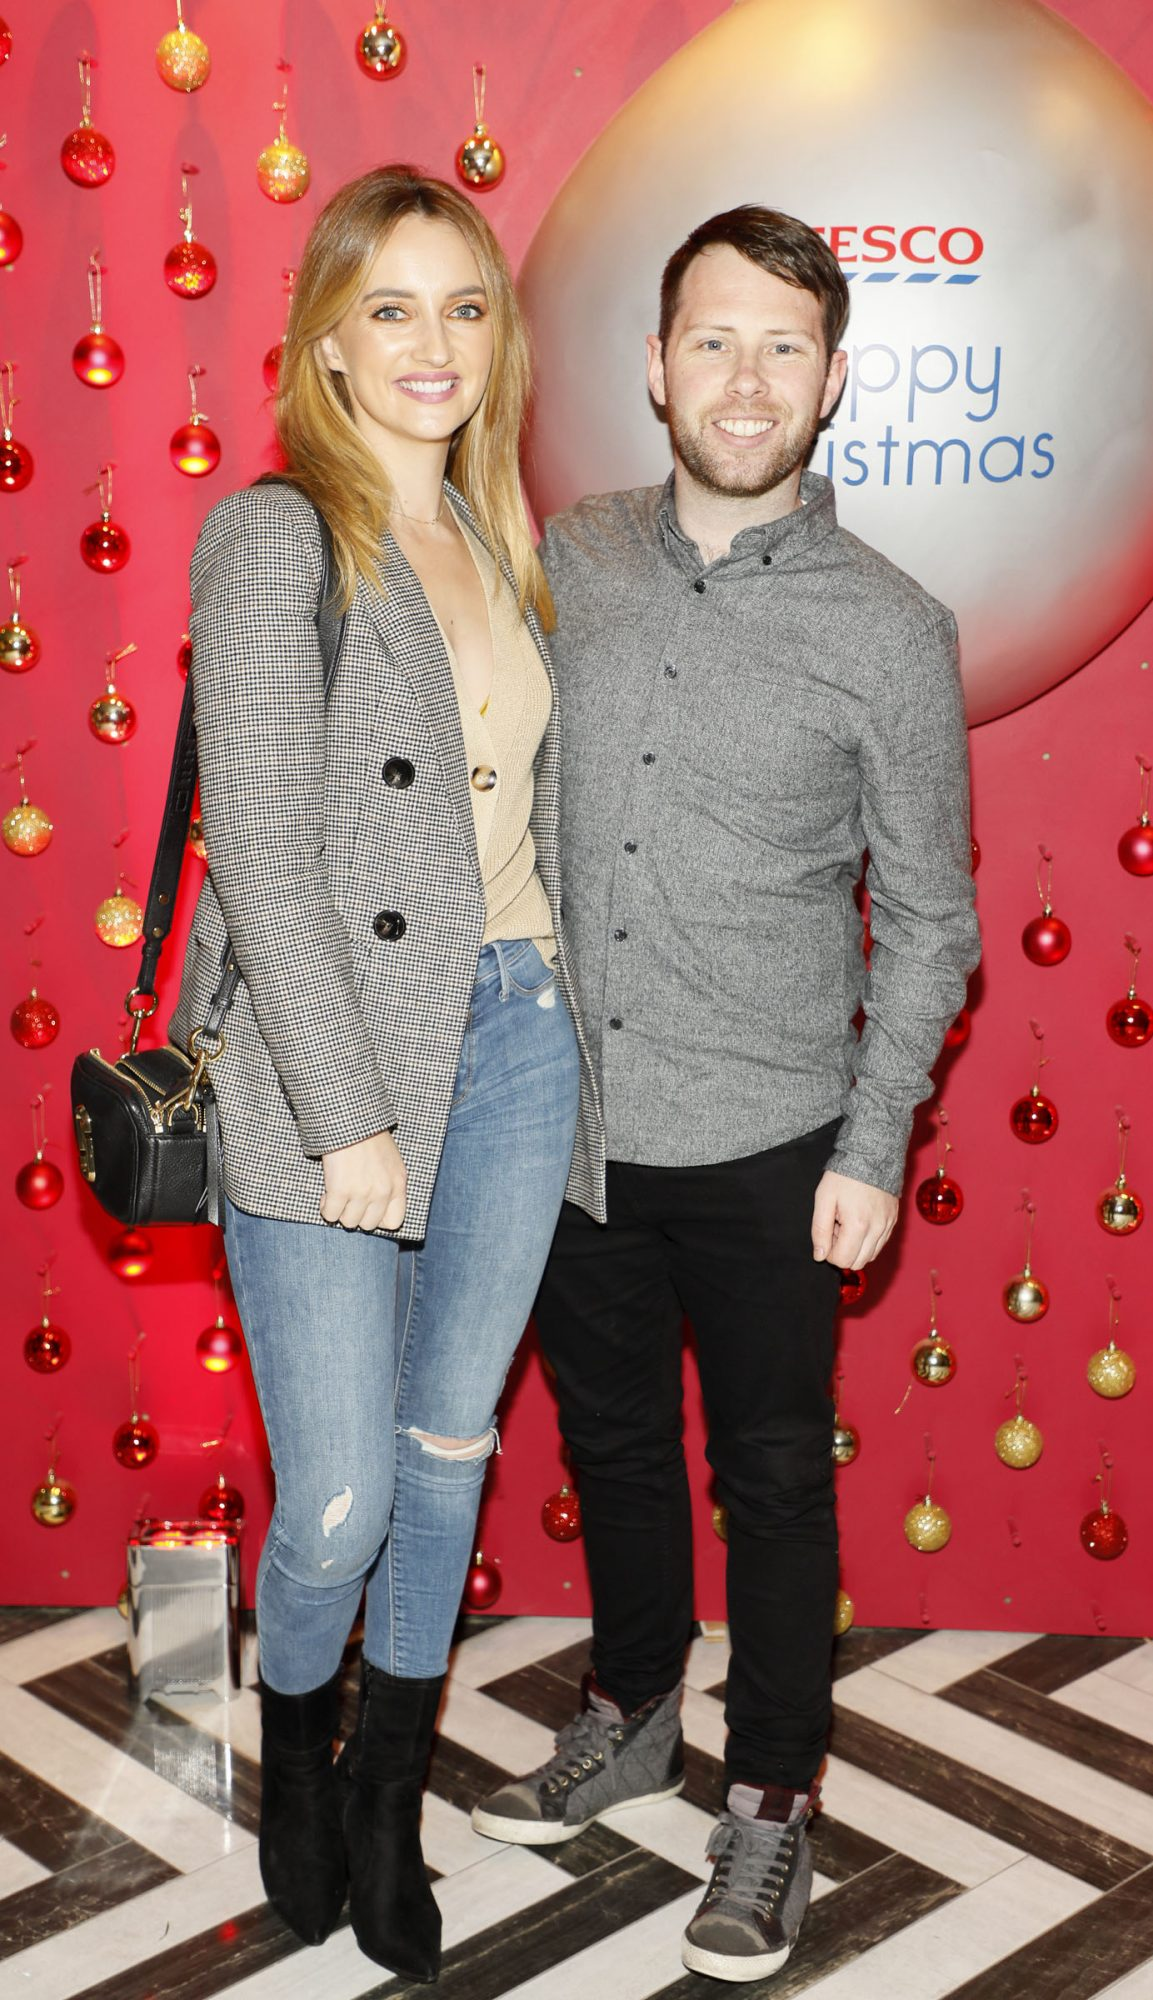 Caroline Foran and Alan Keane at the Tesco 2019 Christmas Showcase in Dublin's Iveagh Garden Hotel.   Photo: Kieran Harnett